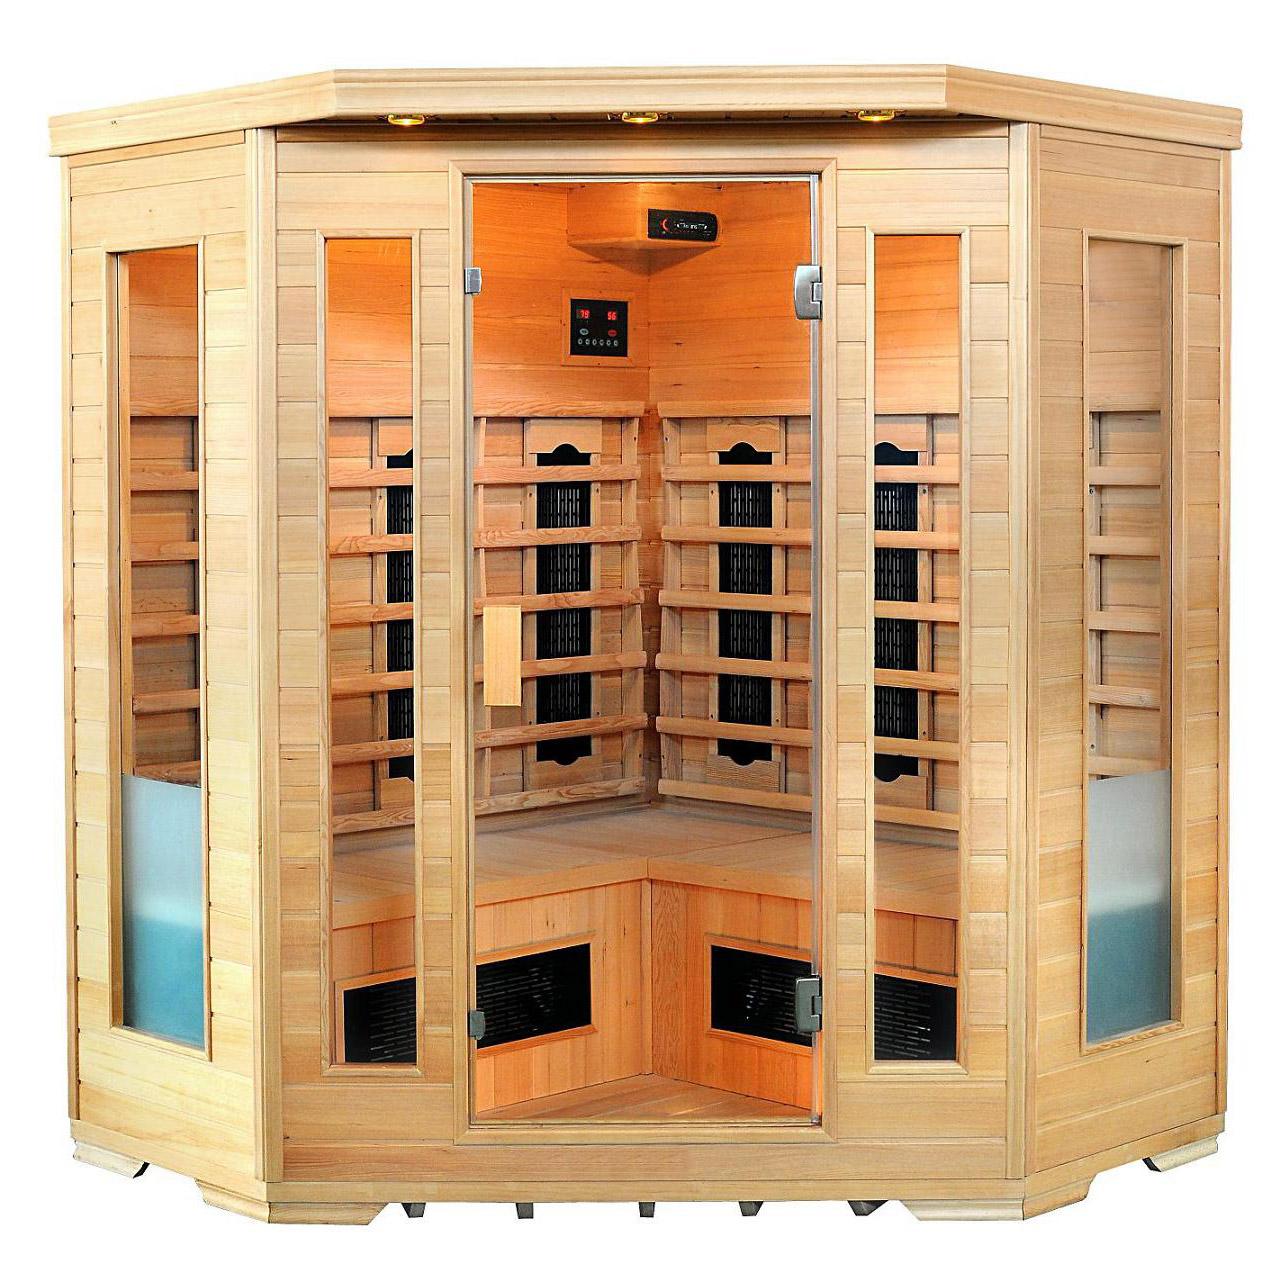 infrarot w rmekabine sauna spitzbergen hemlock ecksauna. Black Bedroom Furniture Sets. Home Design Ideas